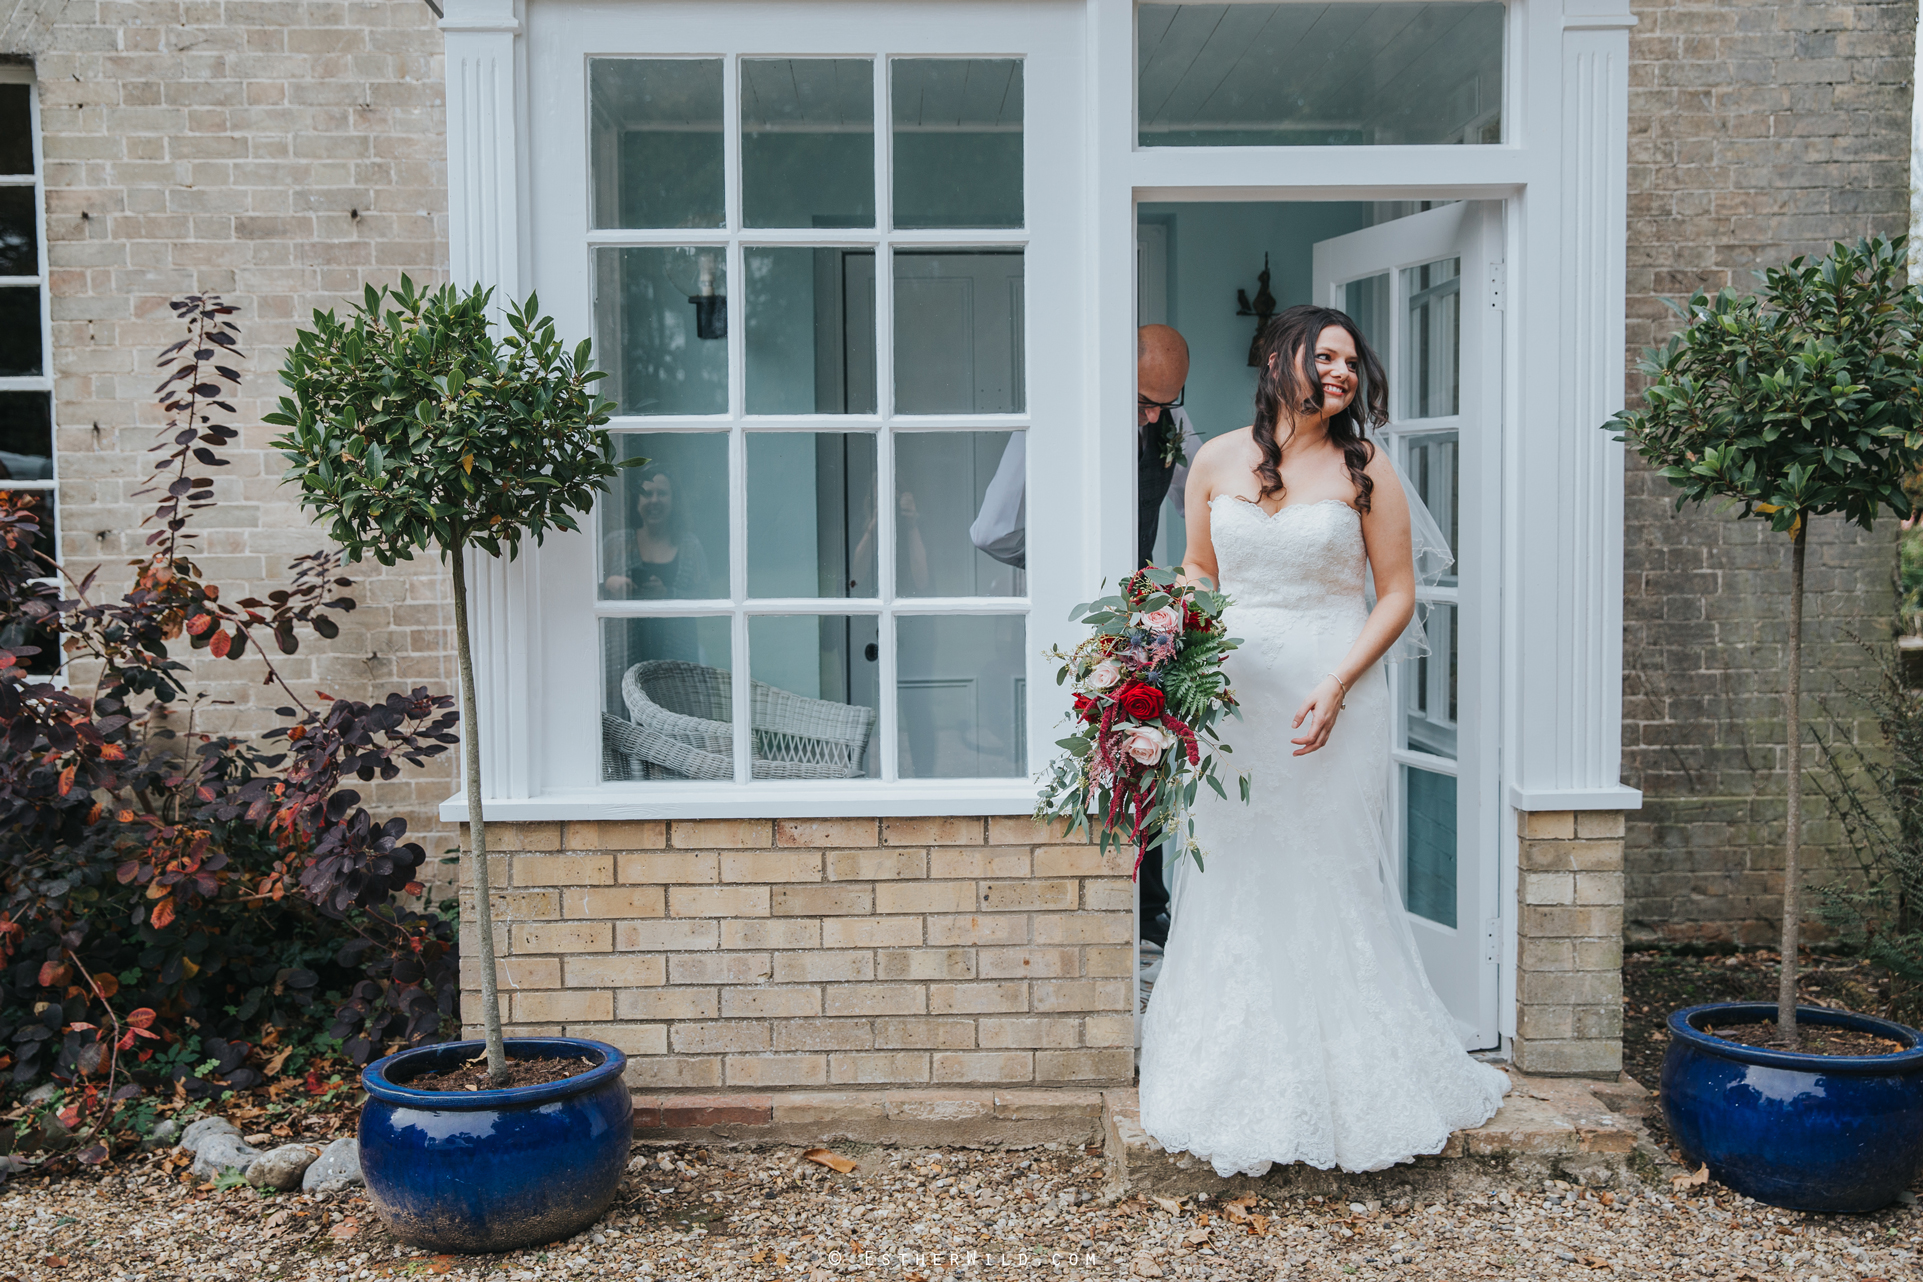 Reading_Room_Weddings_Alby_Norwich_Photographer_Esther_Wild_IMG_0734.jpg